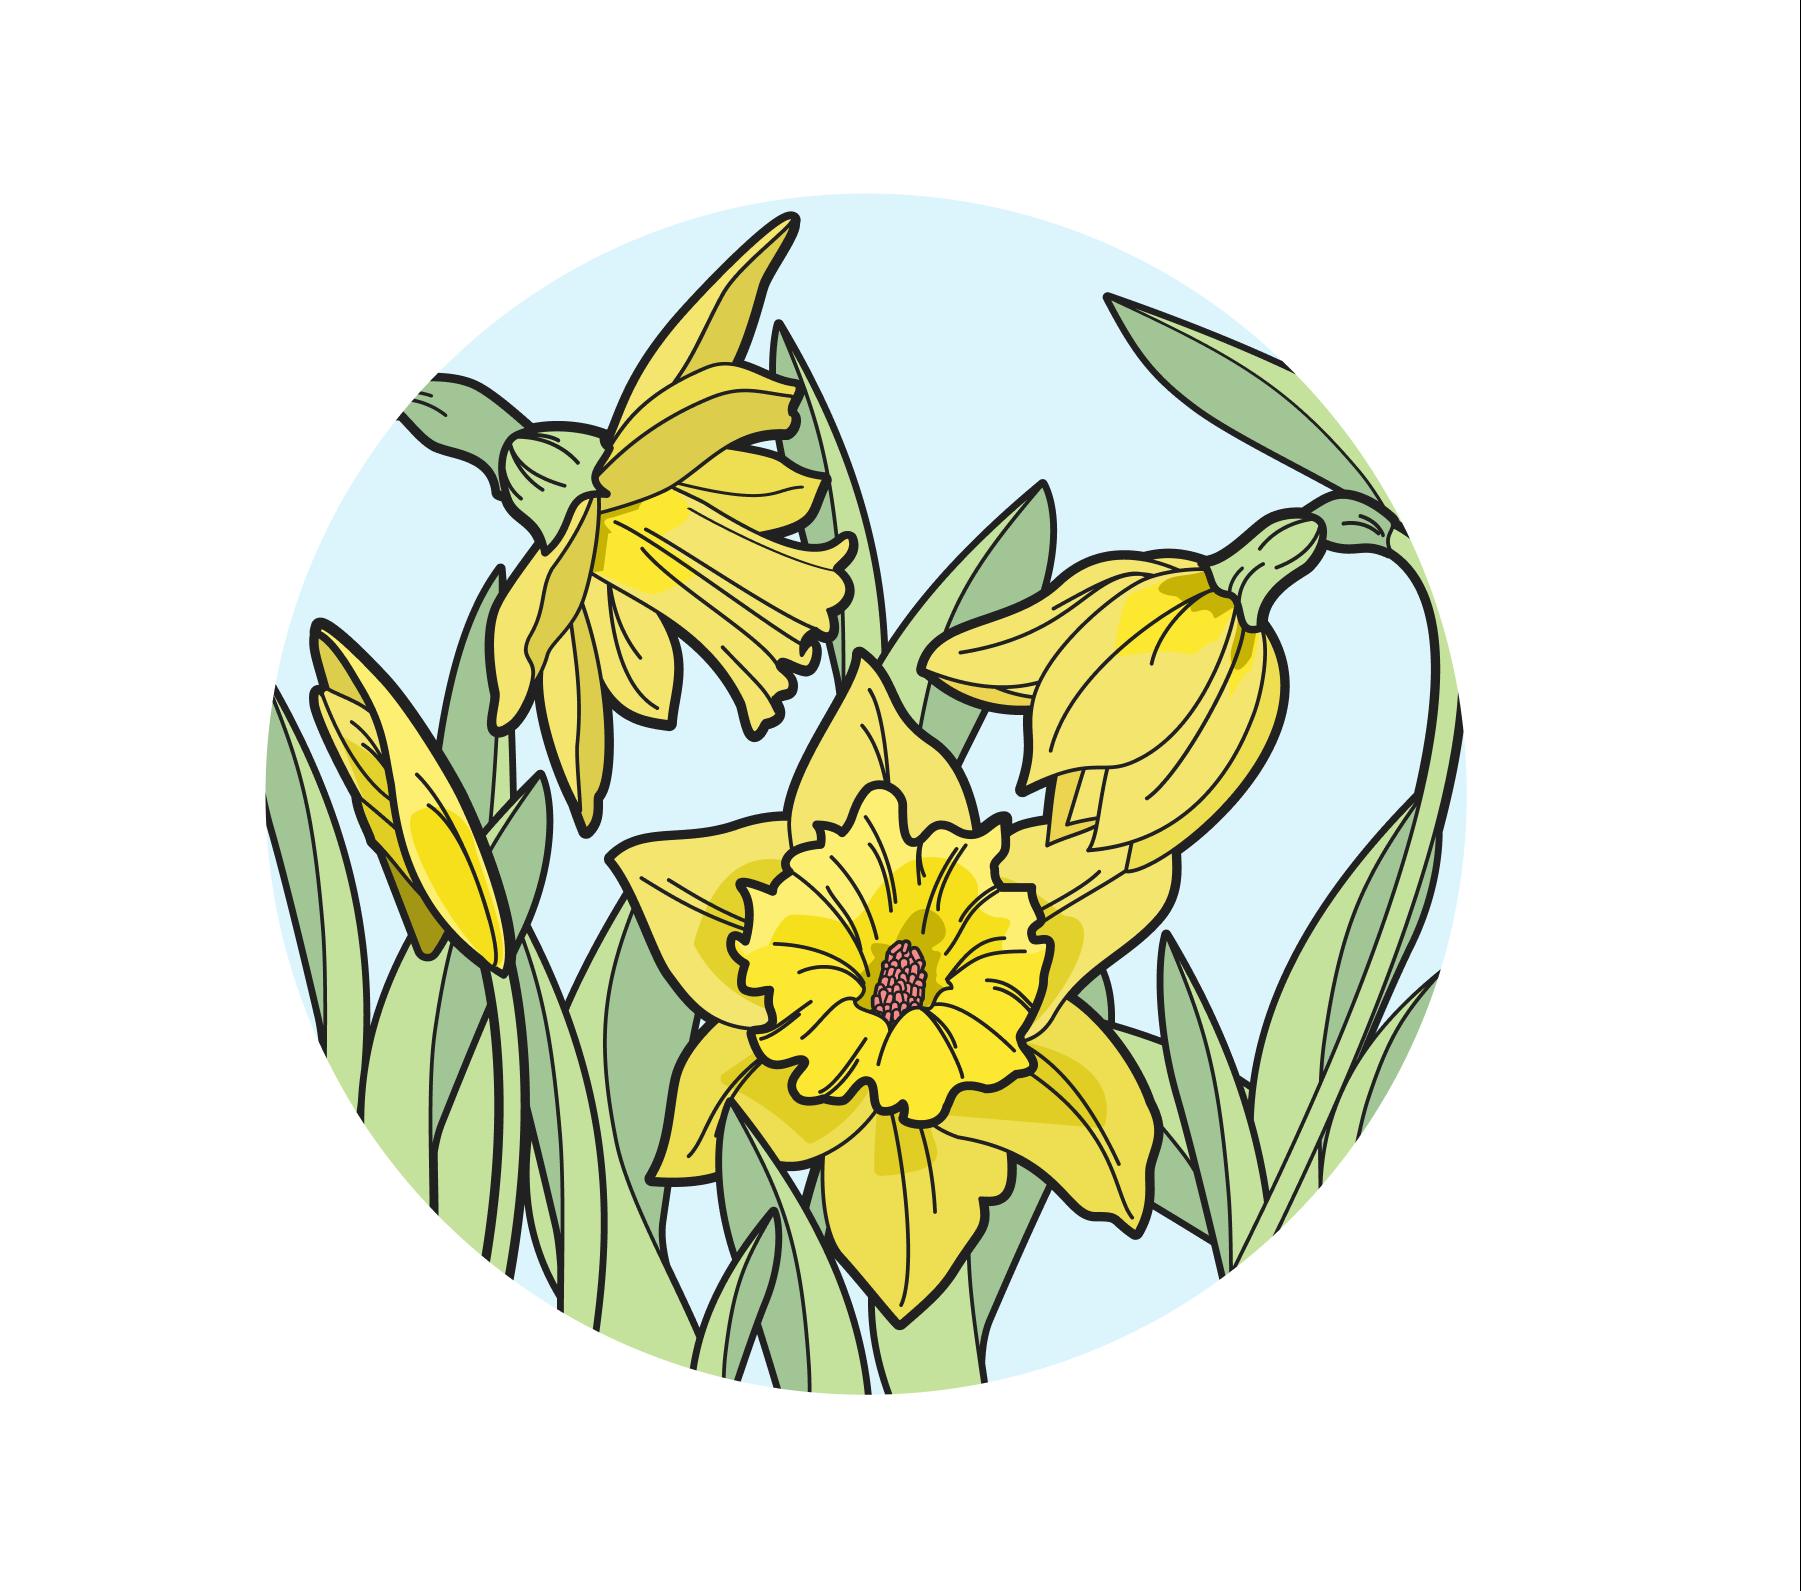 Daffodils illustration